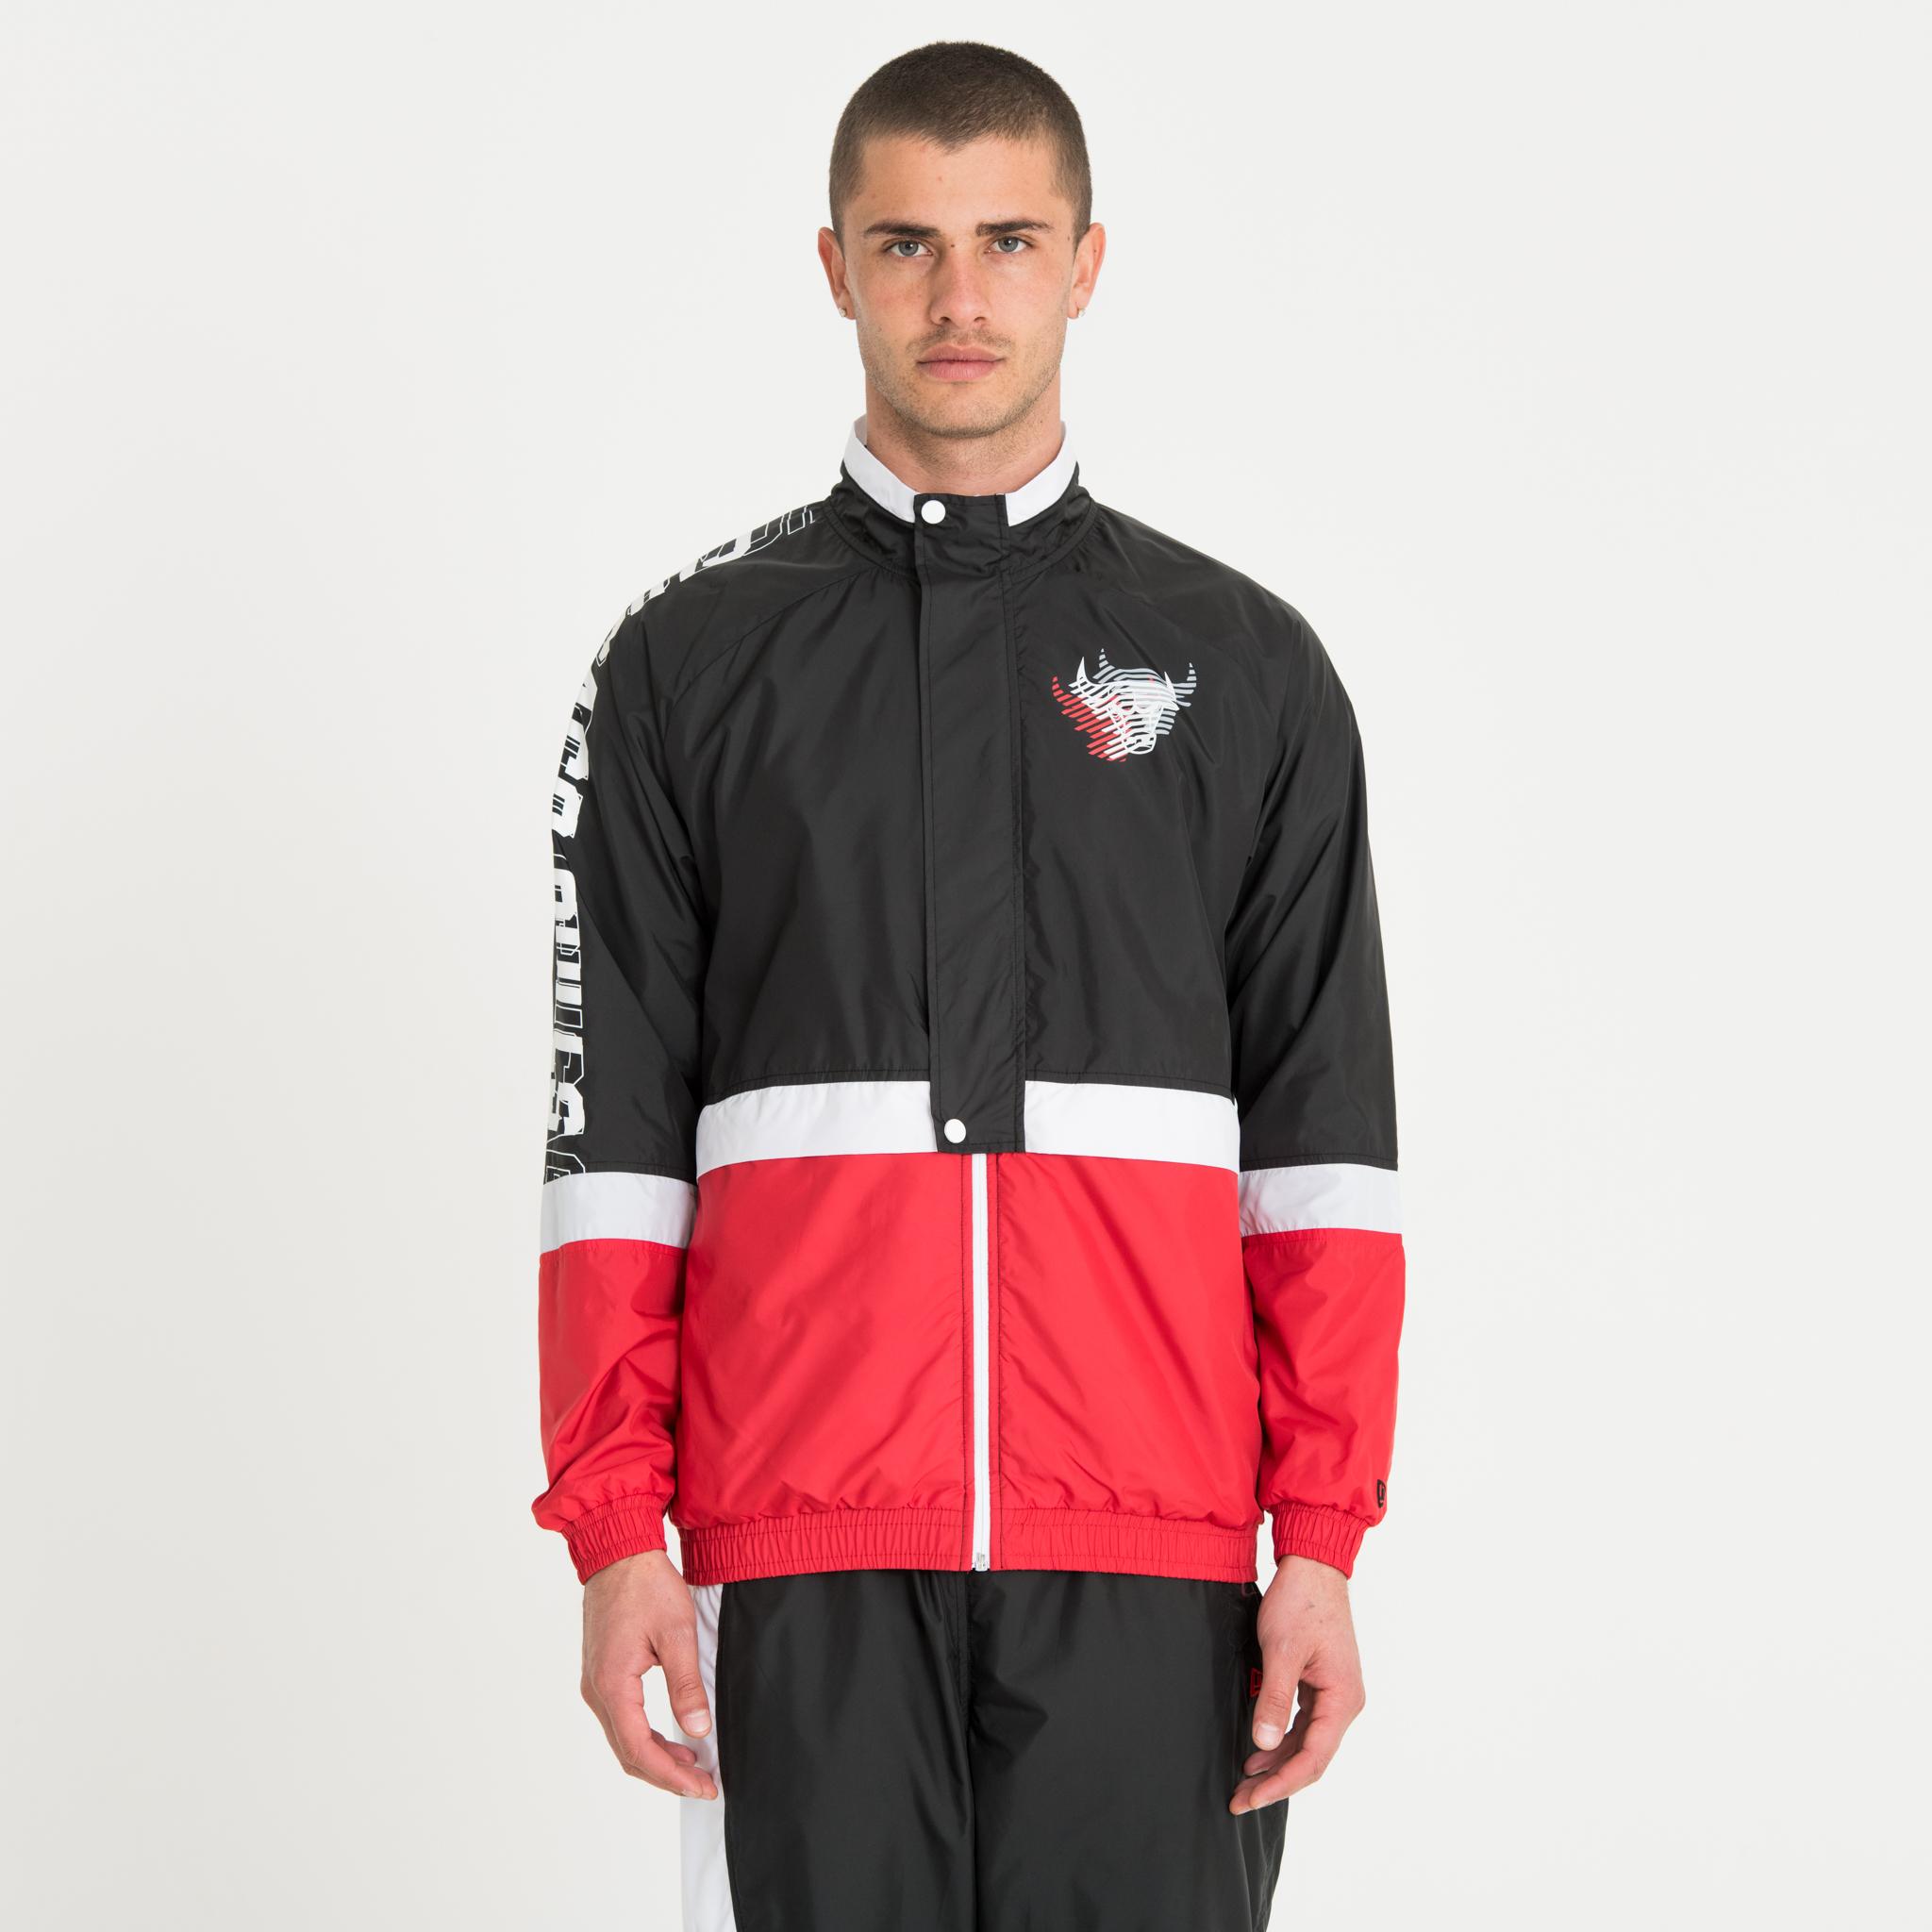 Trainingsjacke der Chicago Bulls mit Colour-Block